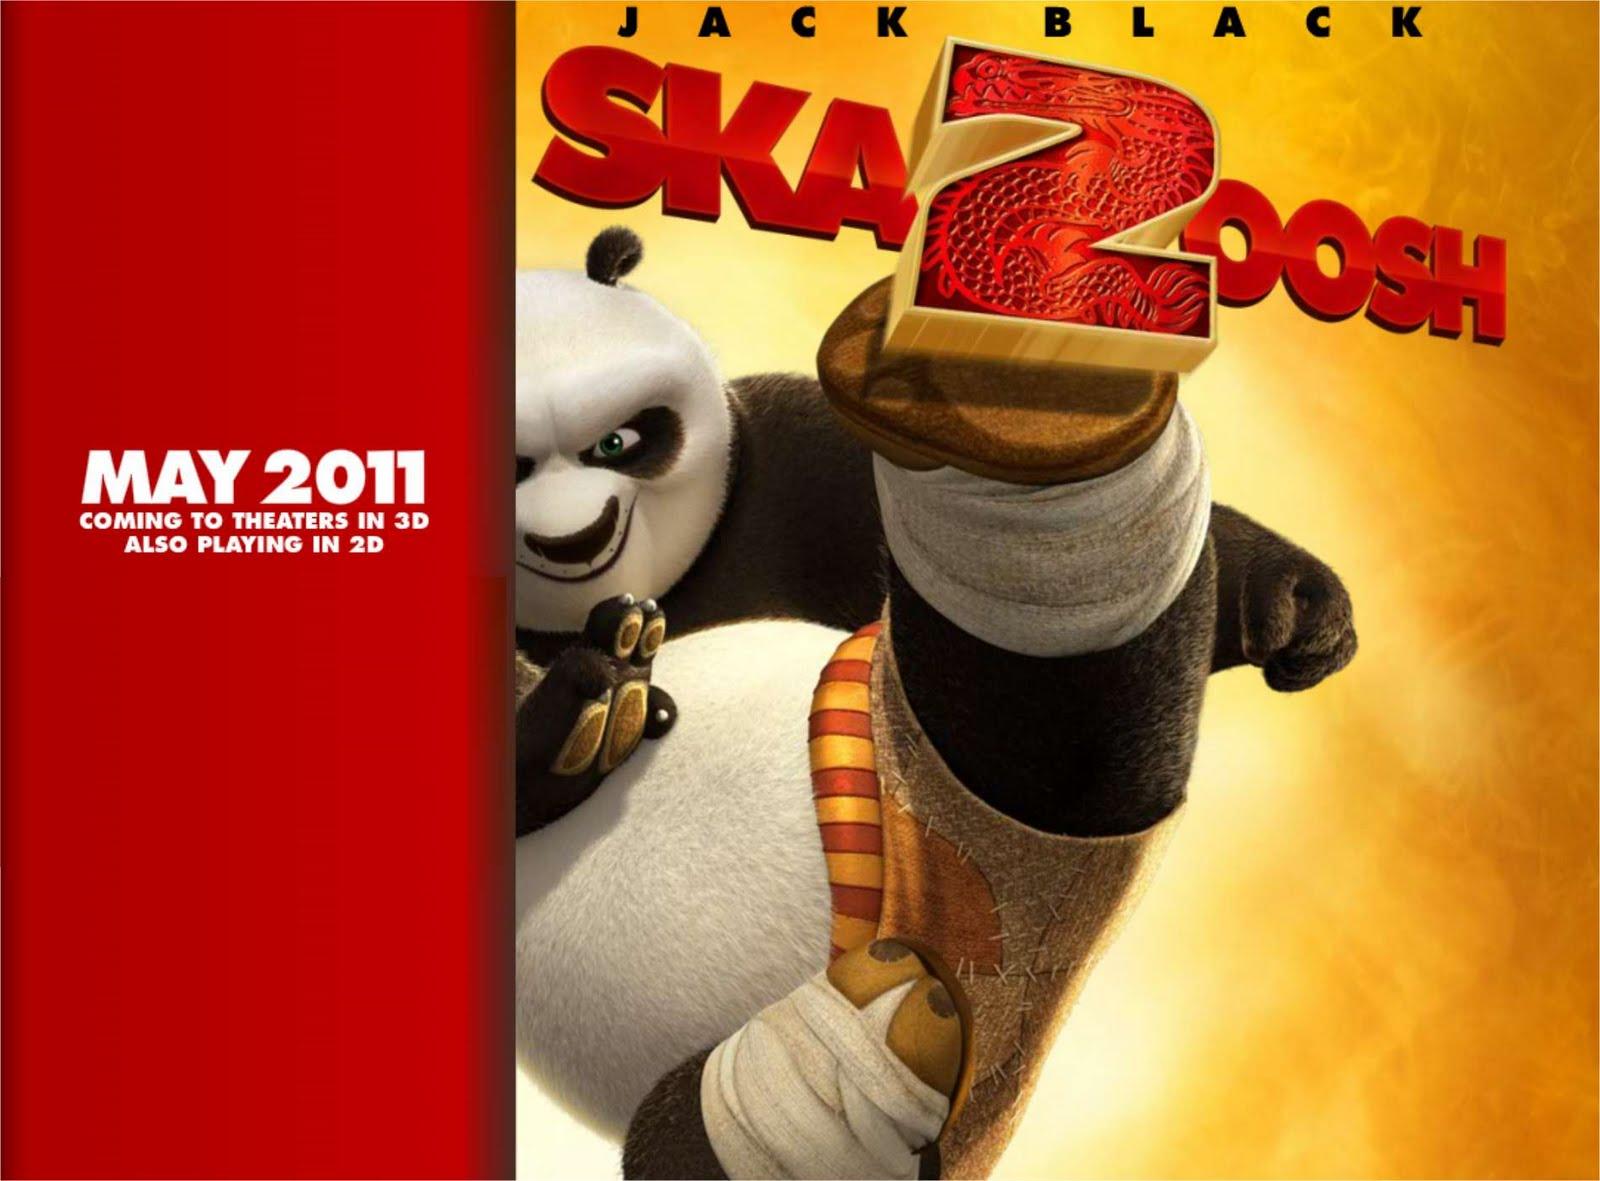 http://1.bp.blogspot.com/-c_kqv-Ik9vI/TevIV-xRsMI/AAAAAAAAAiY/GkRB_2ybuWQ/s1600/Kung+Fu+Panda+2+Wallpapers-2.jpg